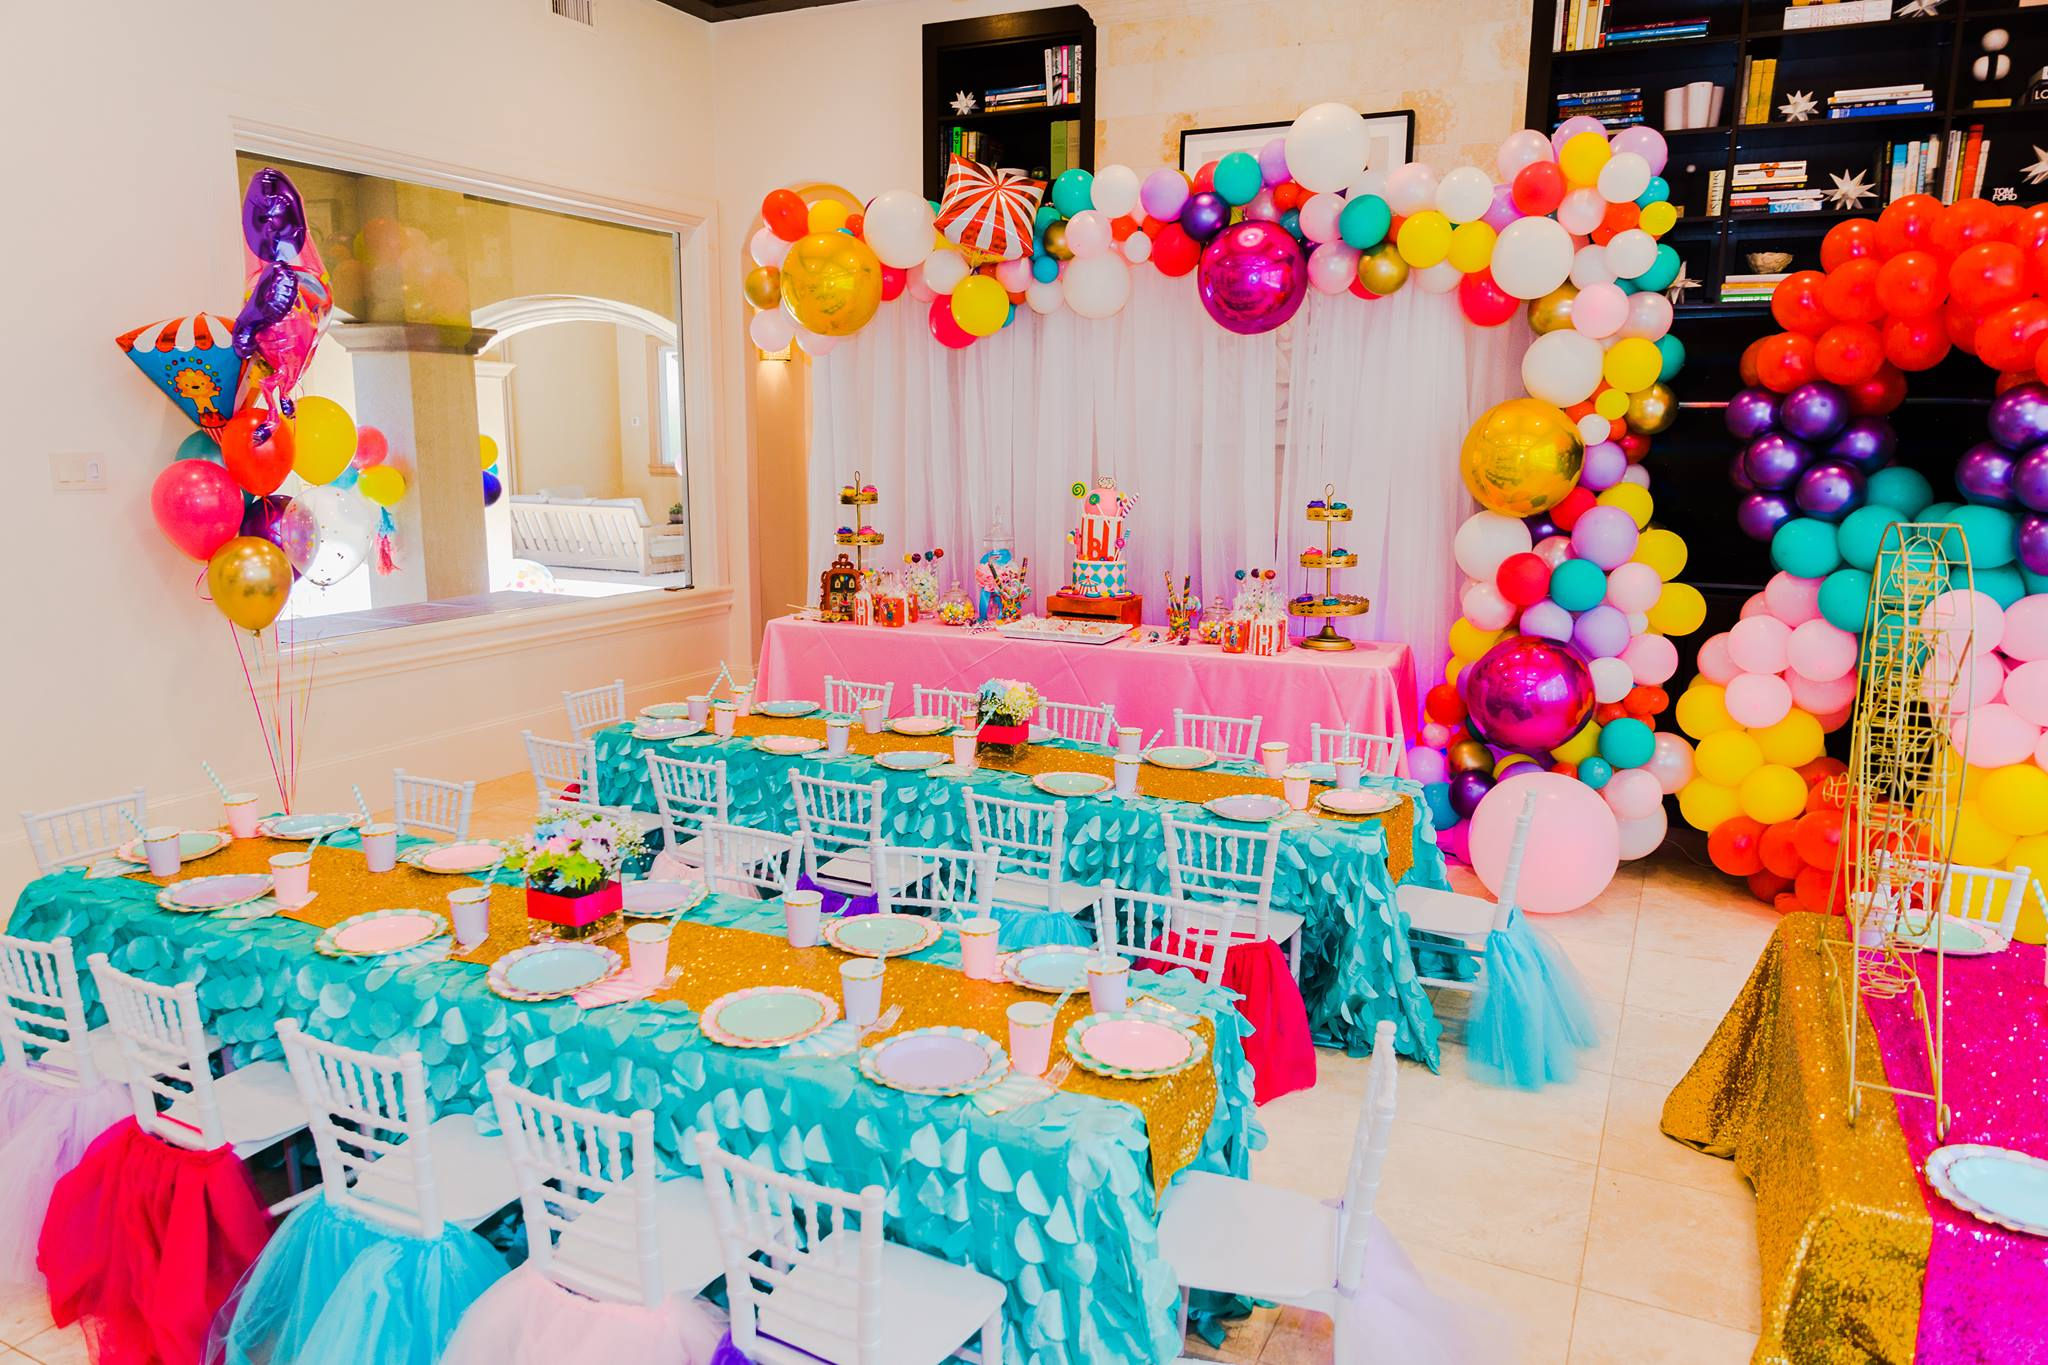 Houston Kids Birthday Party Planner For Children Parties Rainbows Wishes Houston Kids And Children S Birthday And Event Party Planner Kid S Parties Chair Rentals Decorators